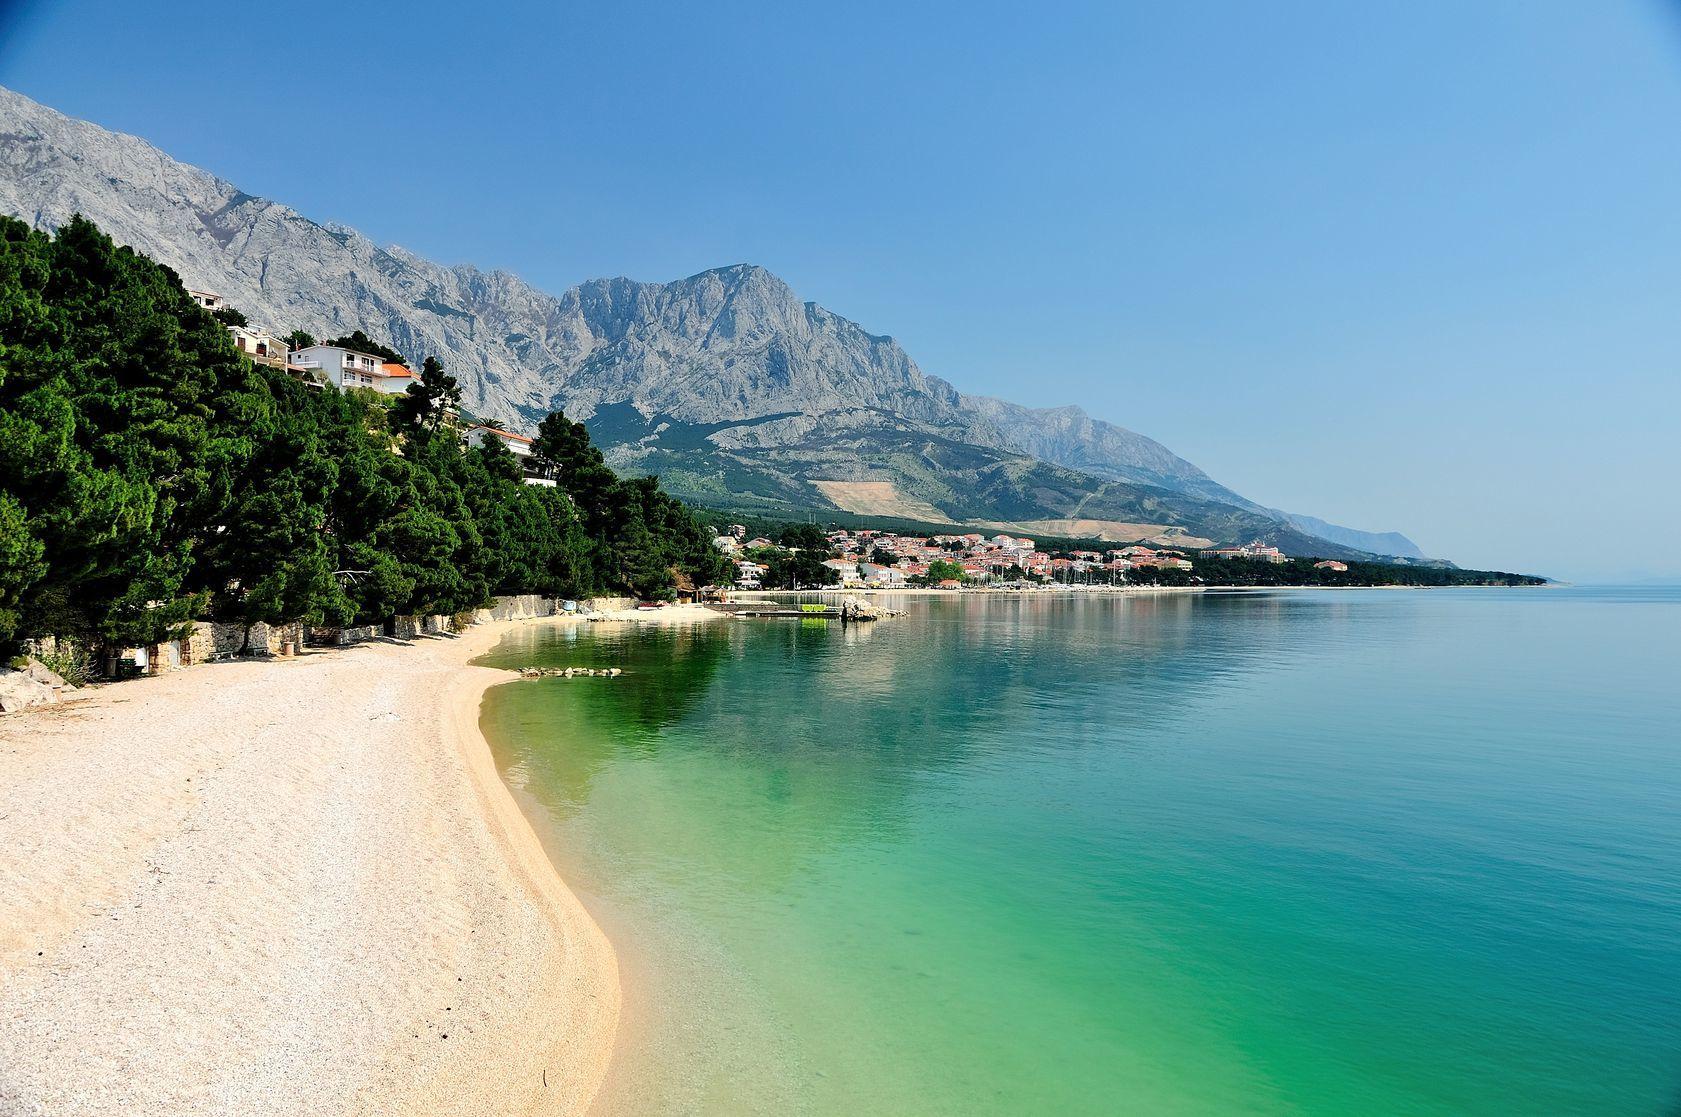 Chorvatská pláž nedaleko města Brela   dalmatianworks123rf/123RF.com